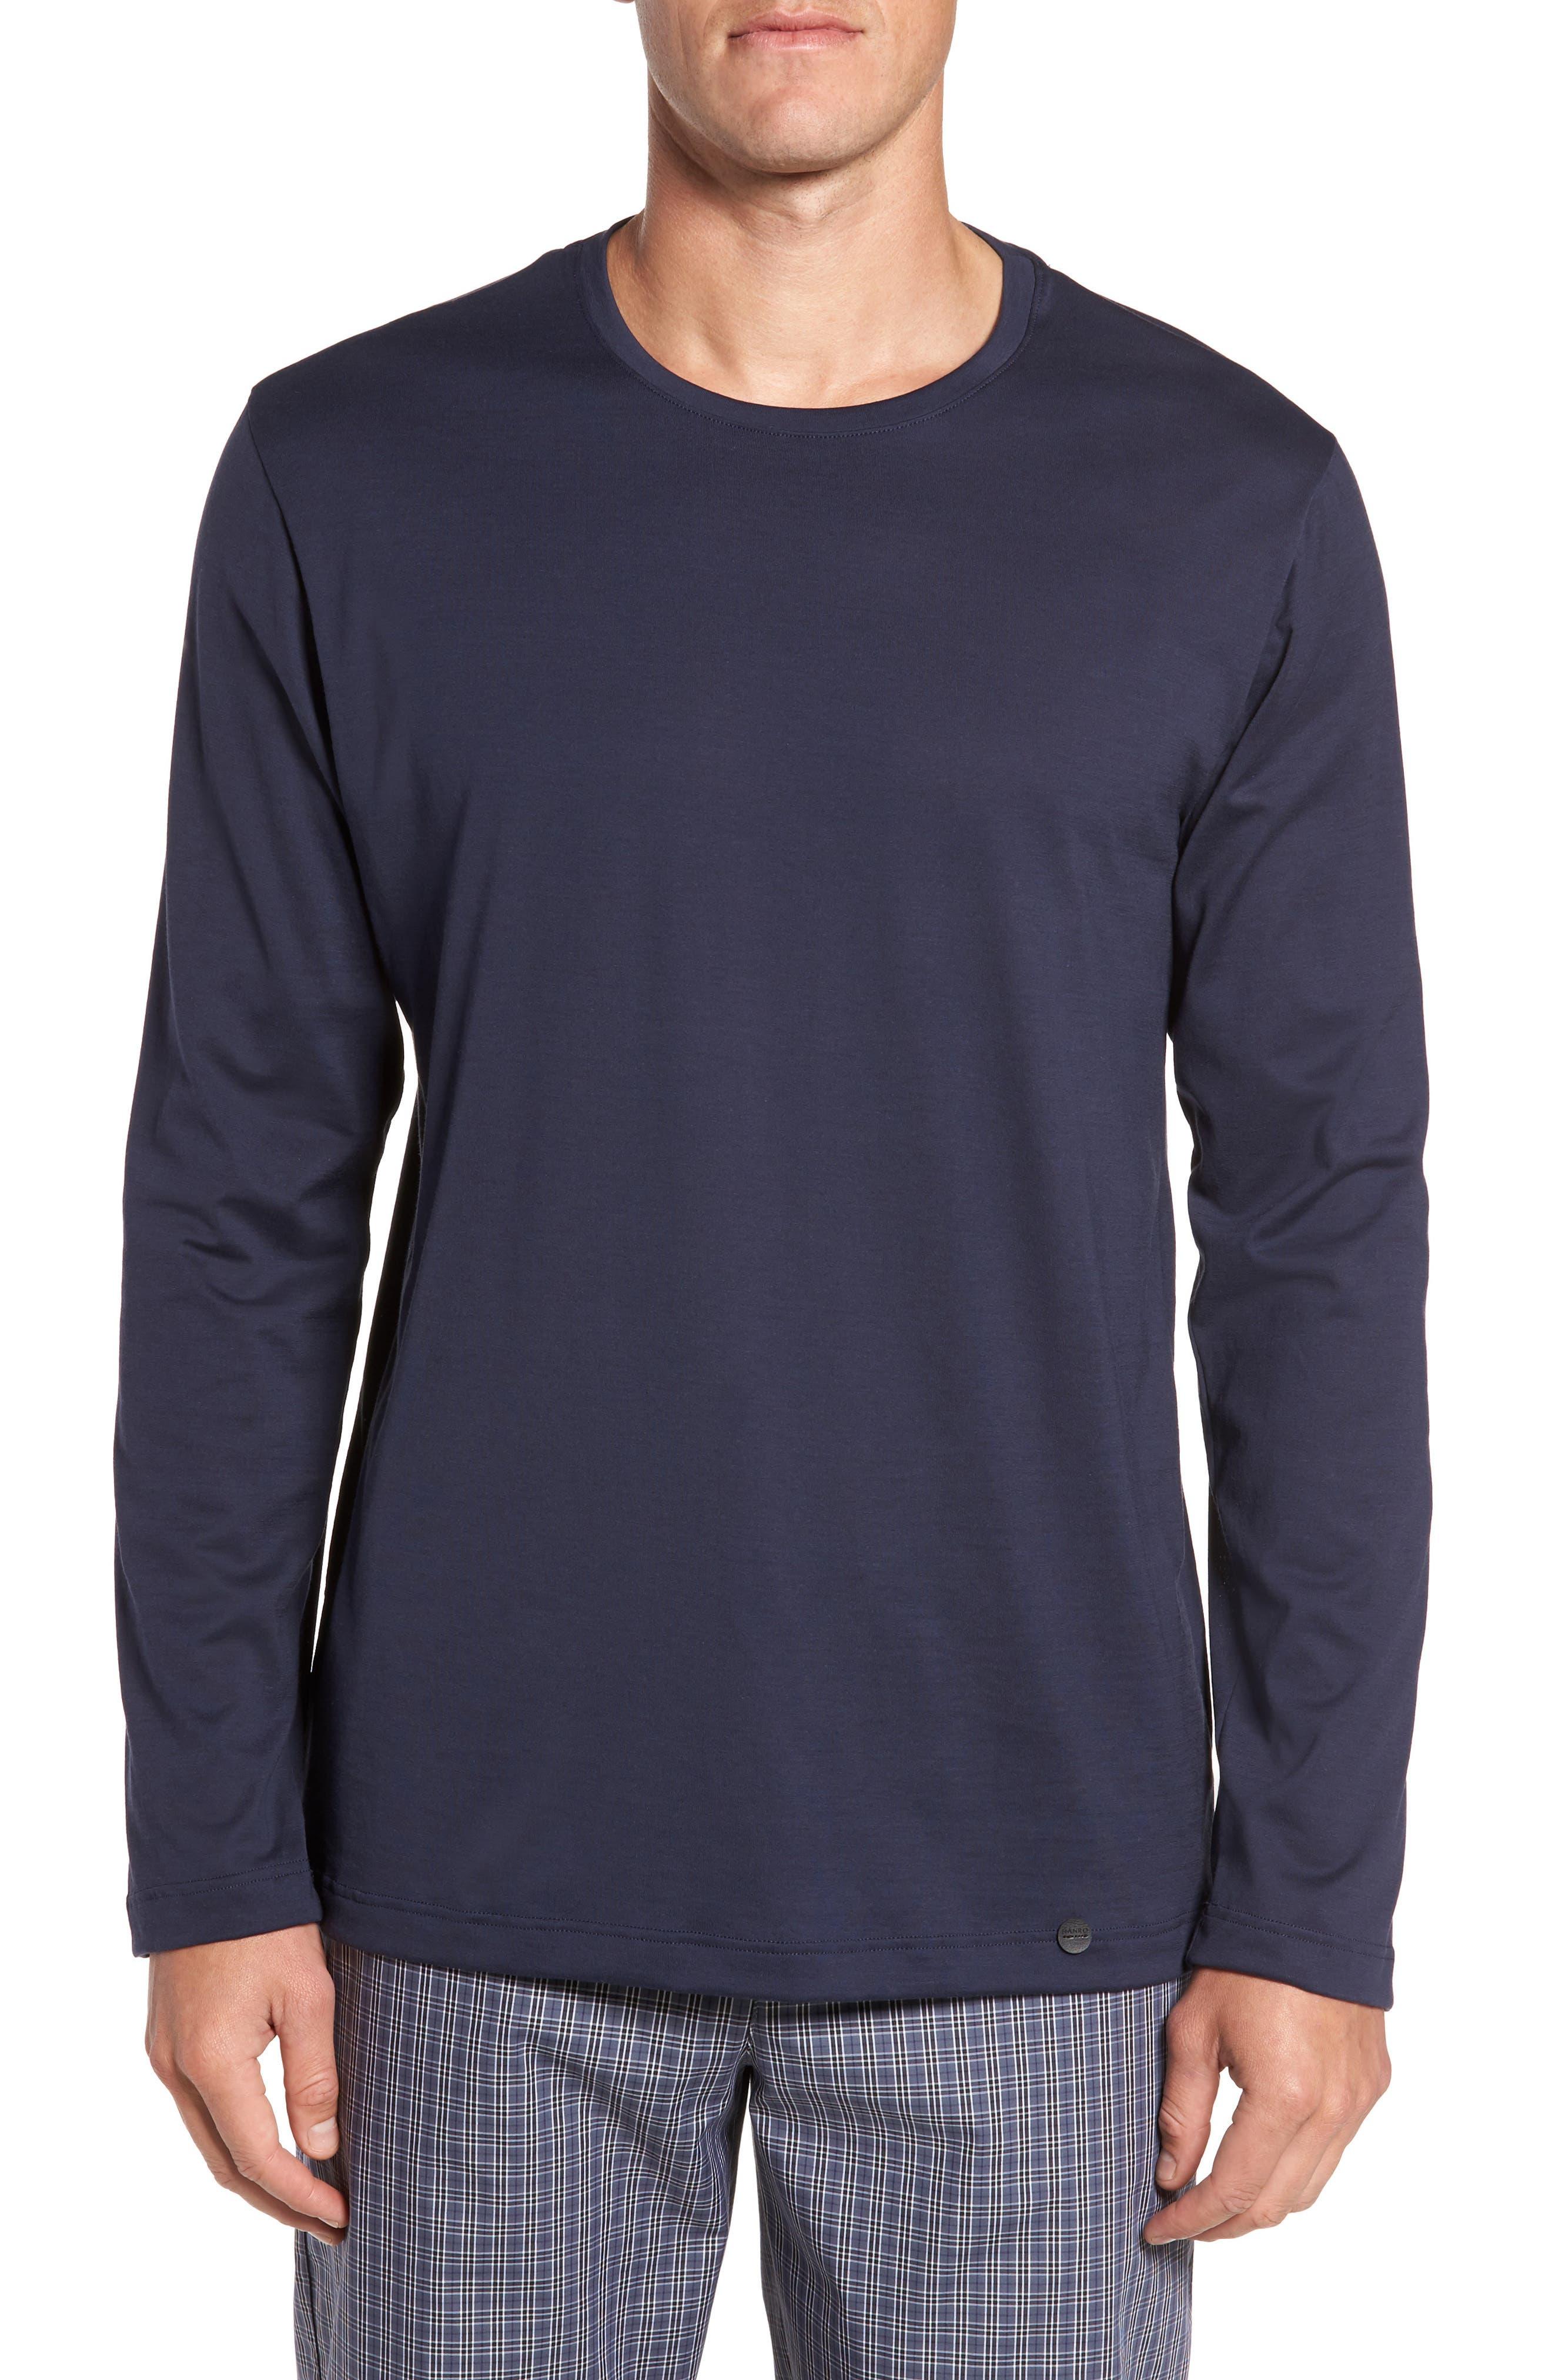 Alternate Image 1 Selected - Hanro Night & Day Lounge T-Shirt